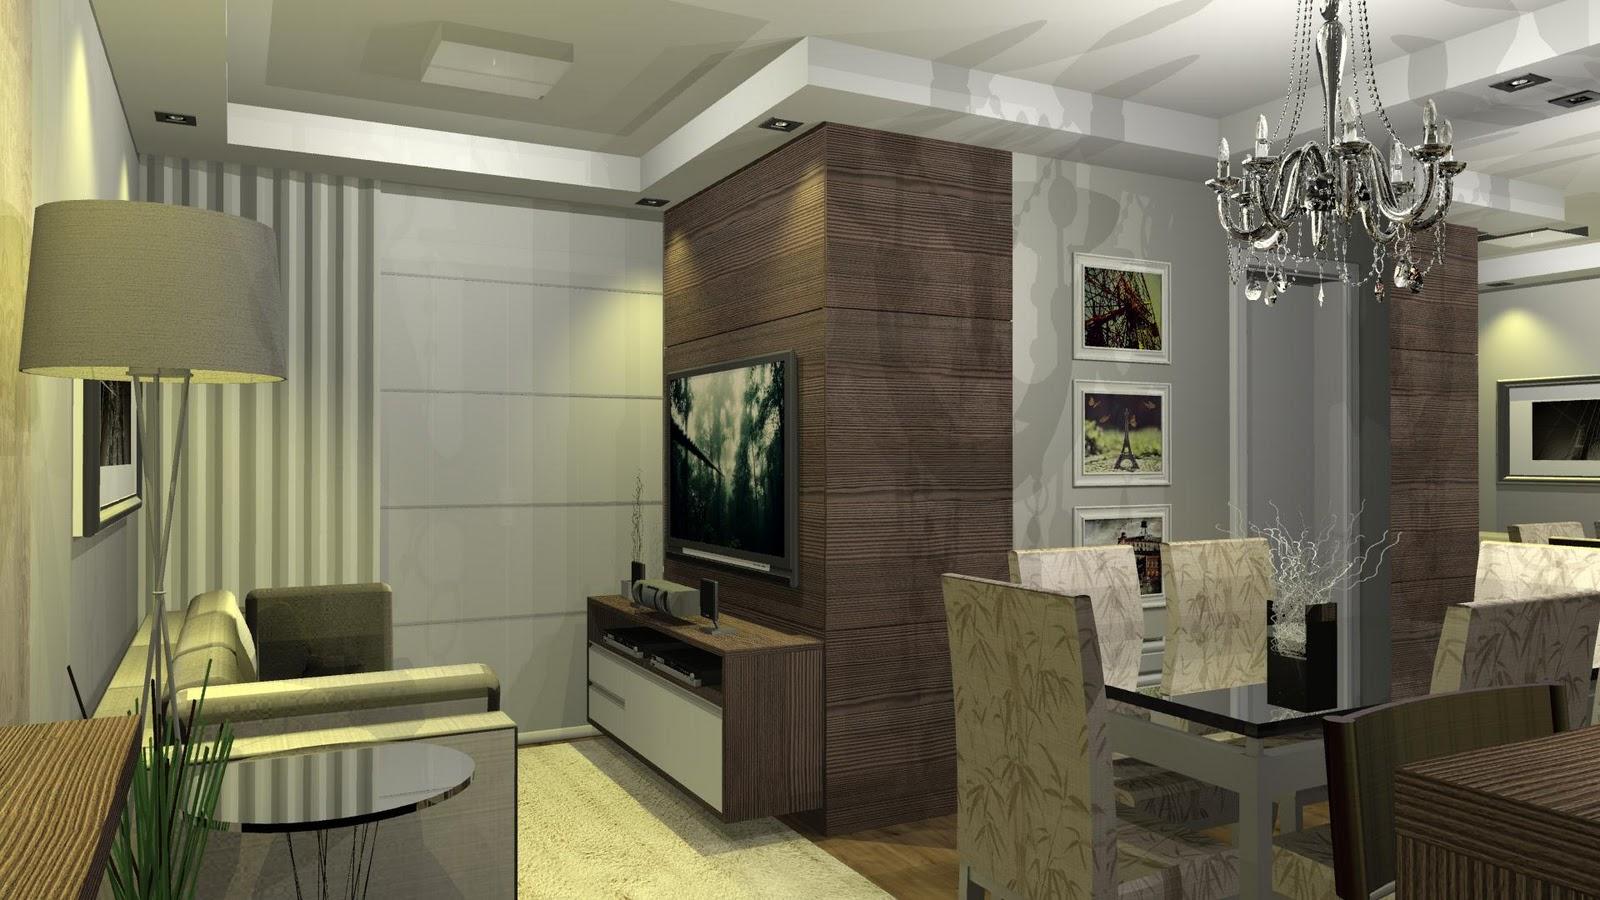 decoracao de ambientes pequenos e integrados : decoracao de ambientes pequenos e integrados:designER Tiago Gelatti: Ambientes Integrados – Pequenos espaços